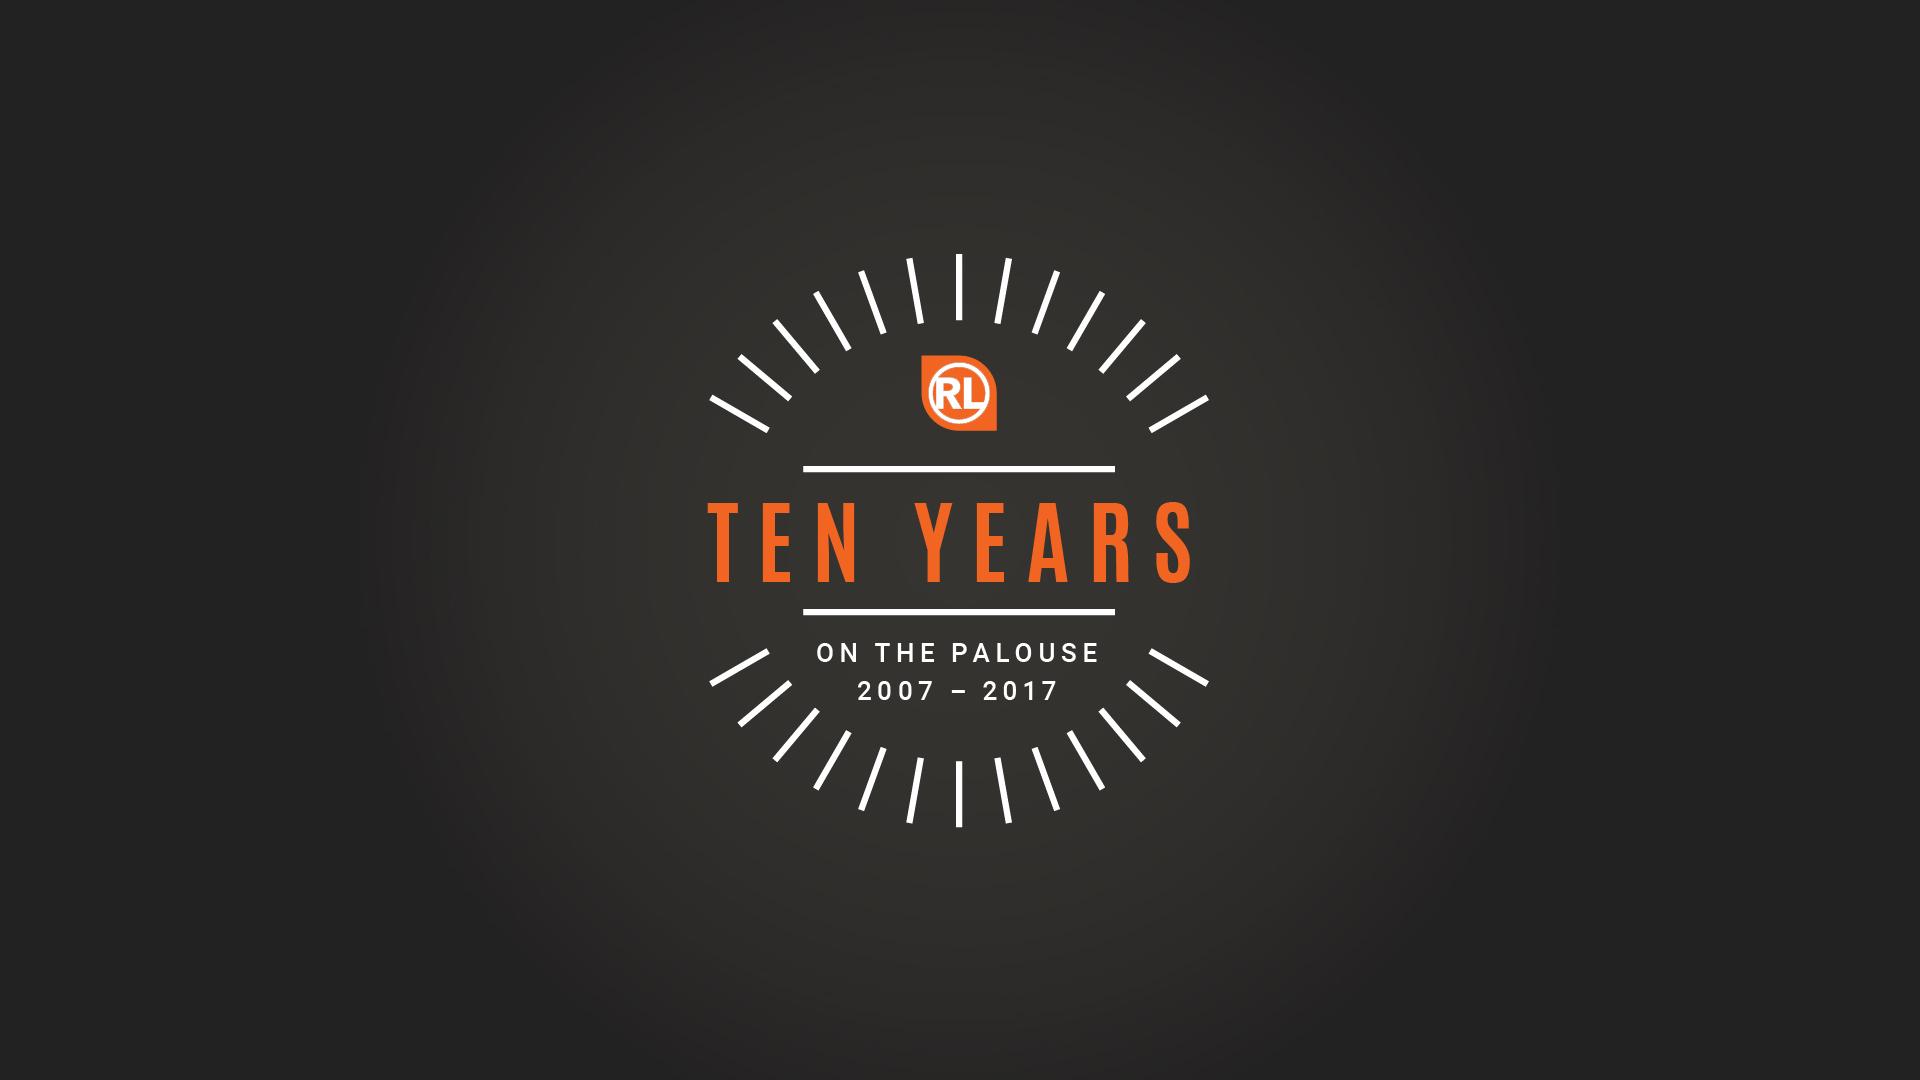 Tenth Anniversary Celebration (2017)